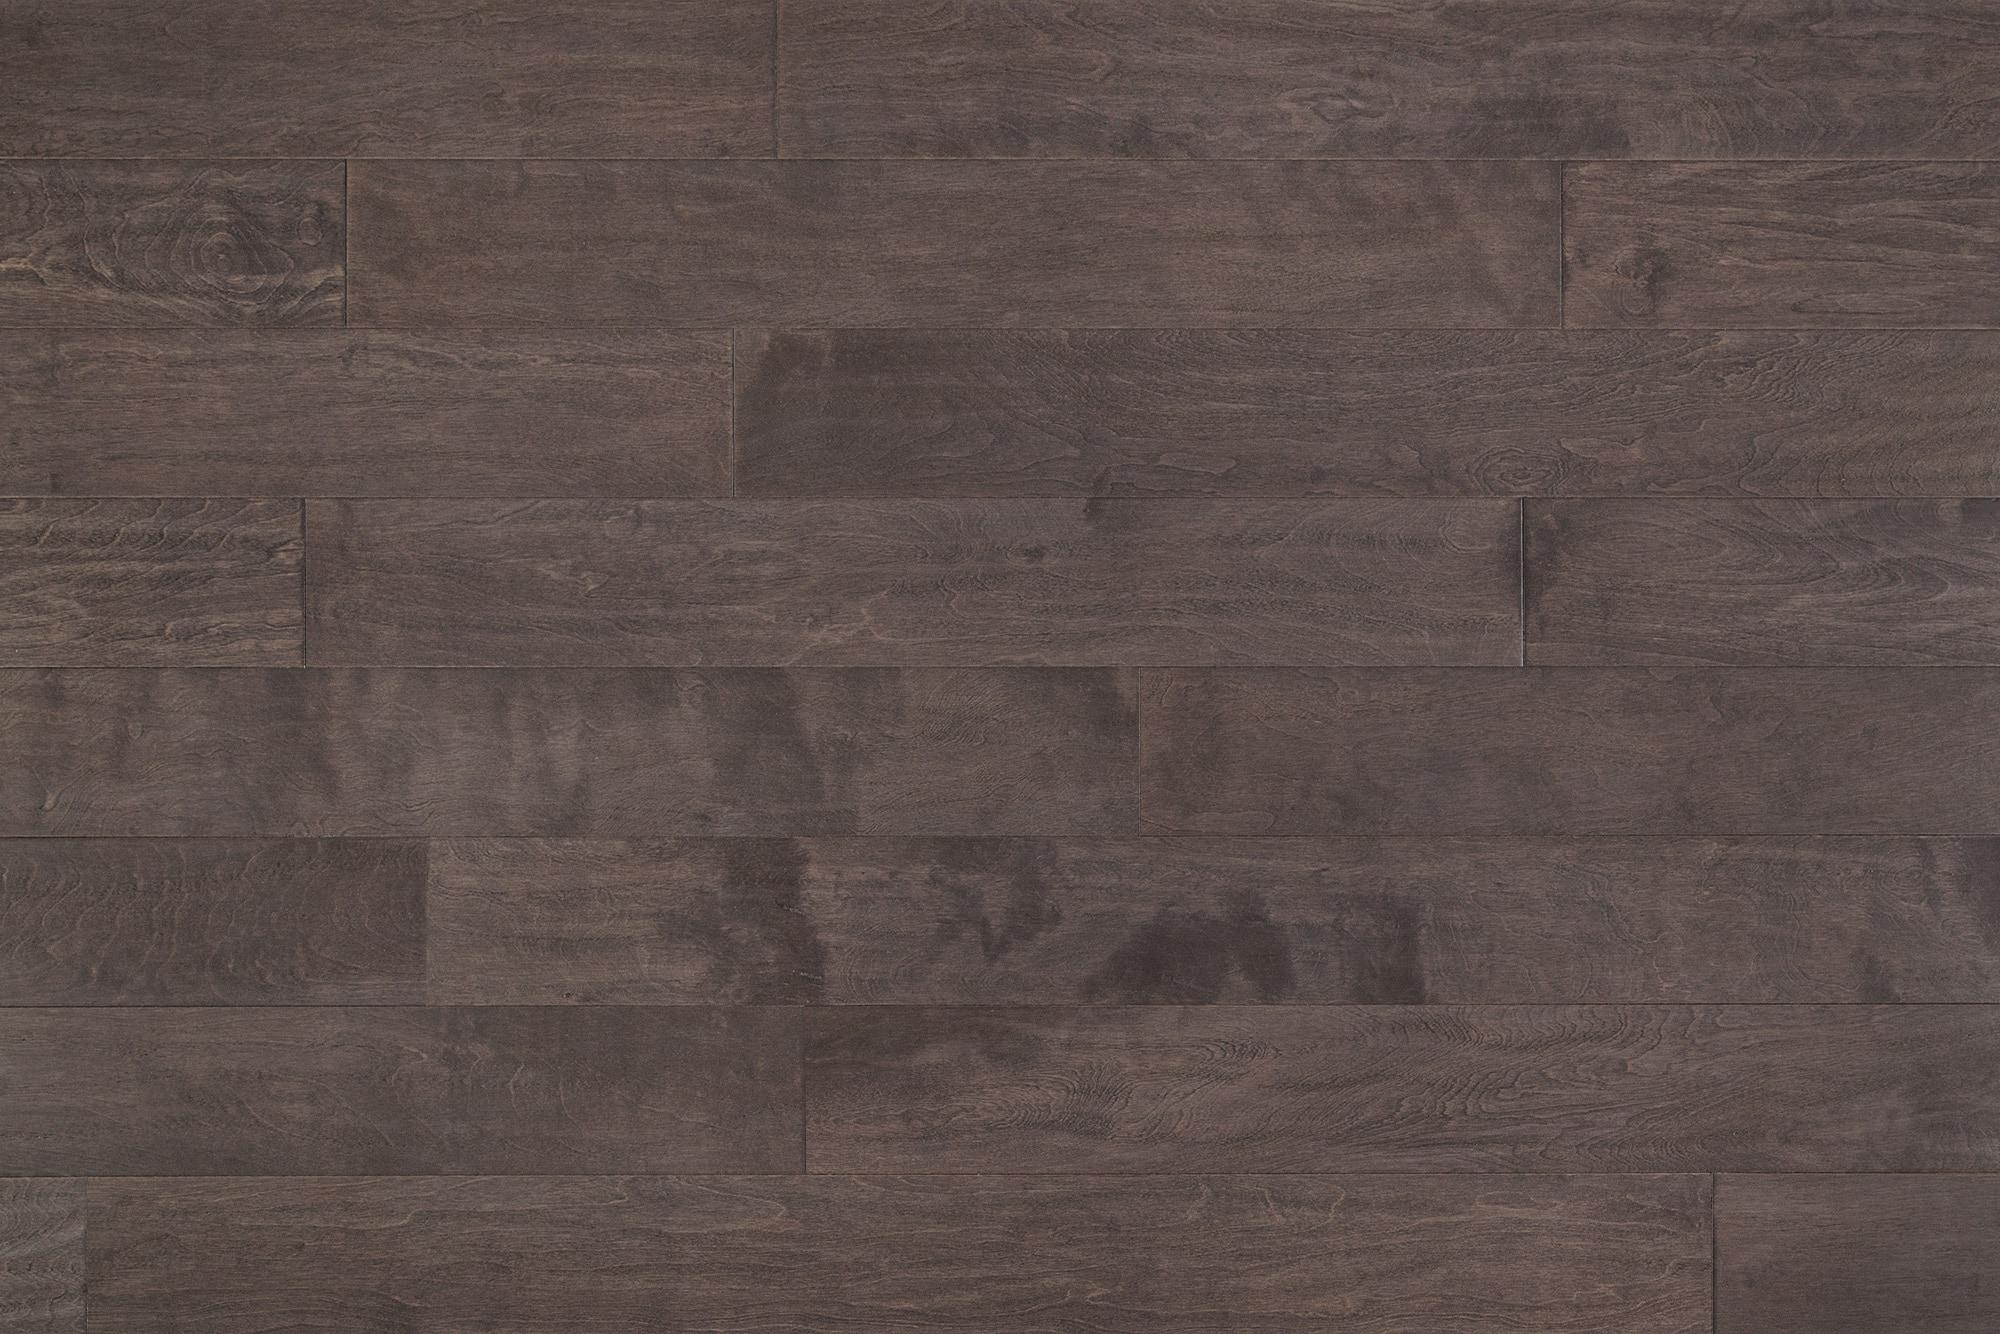 Flooring on clearance builddirect jasper engineered hardwood ocean wave collection dailygadgetfo Choice Image